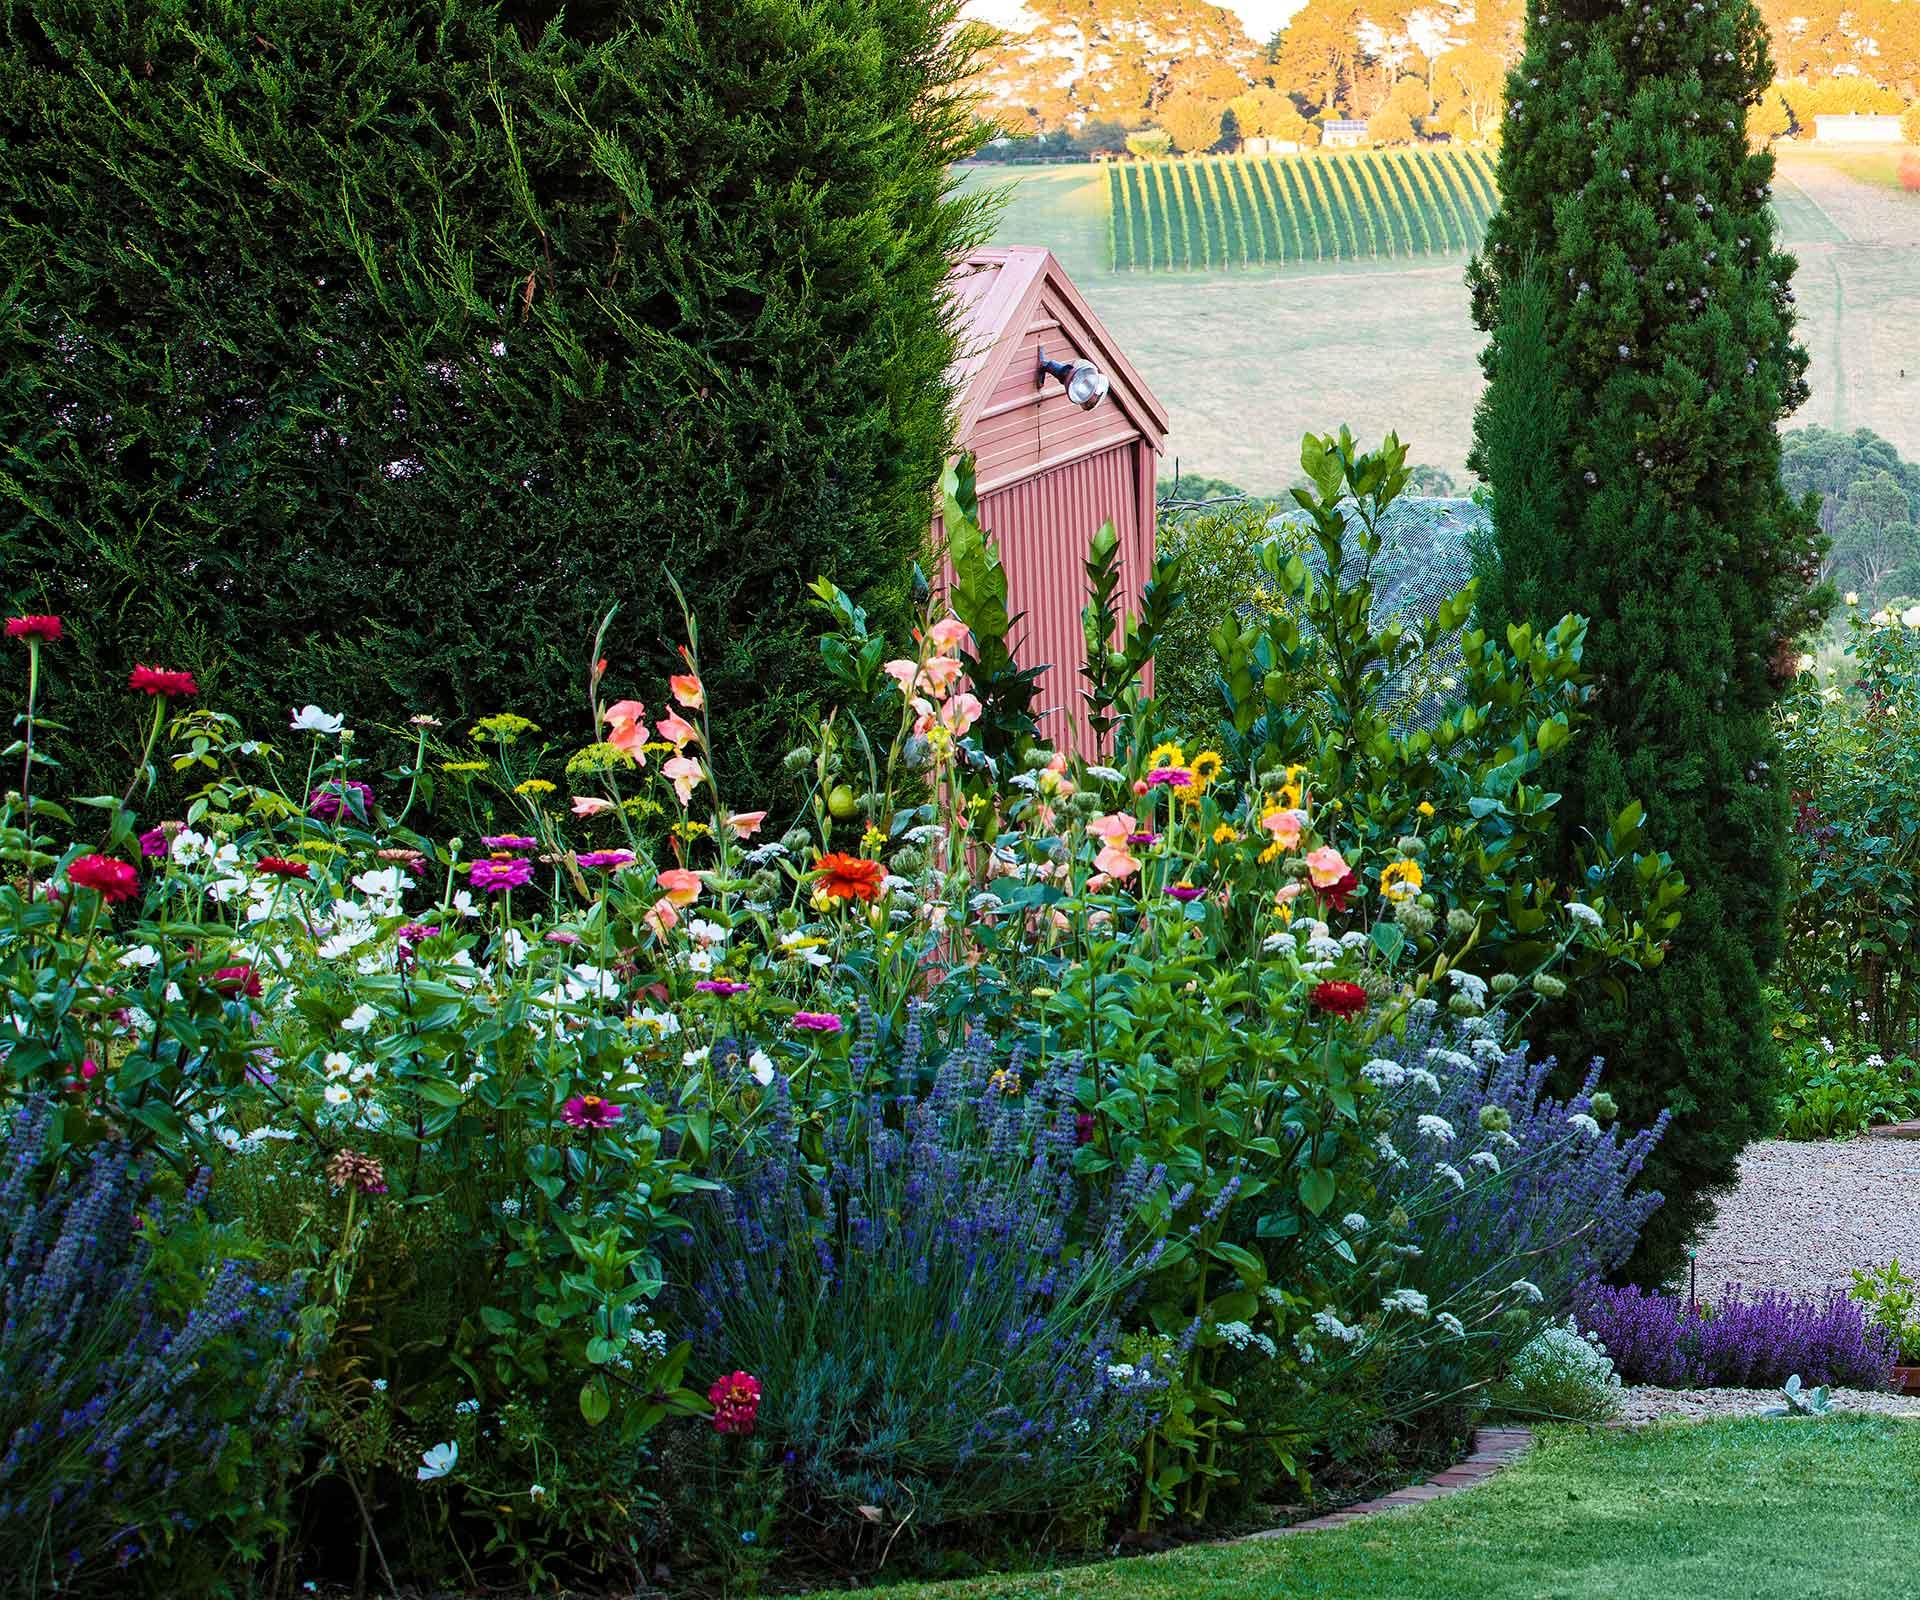 Garden And Concepts On Flipboard By Norita Tahir